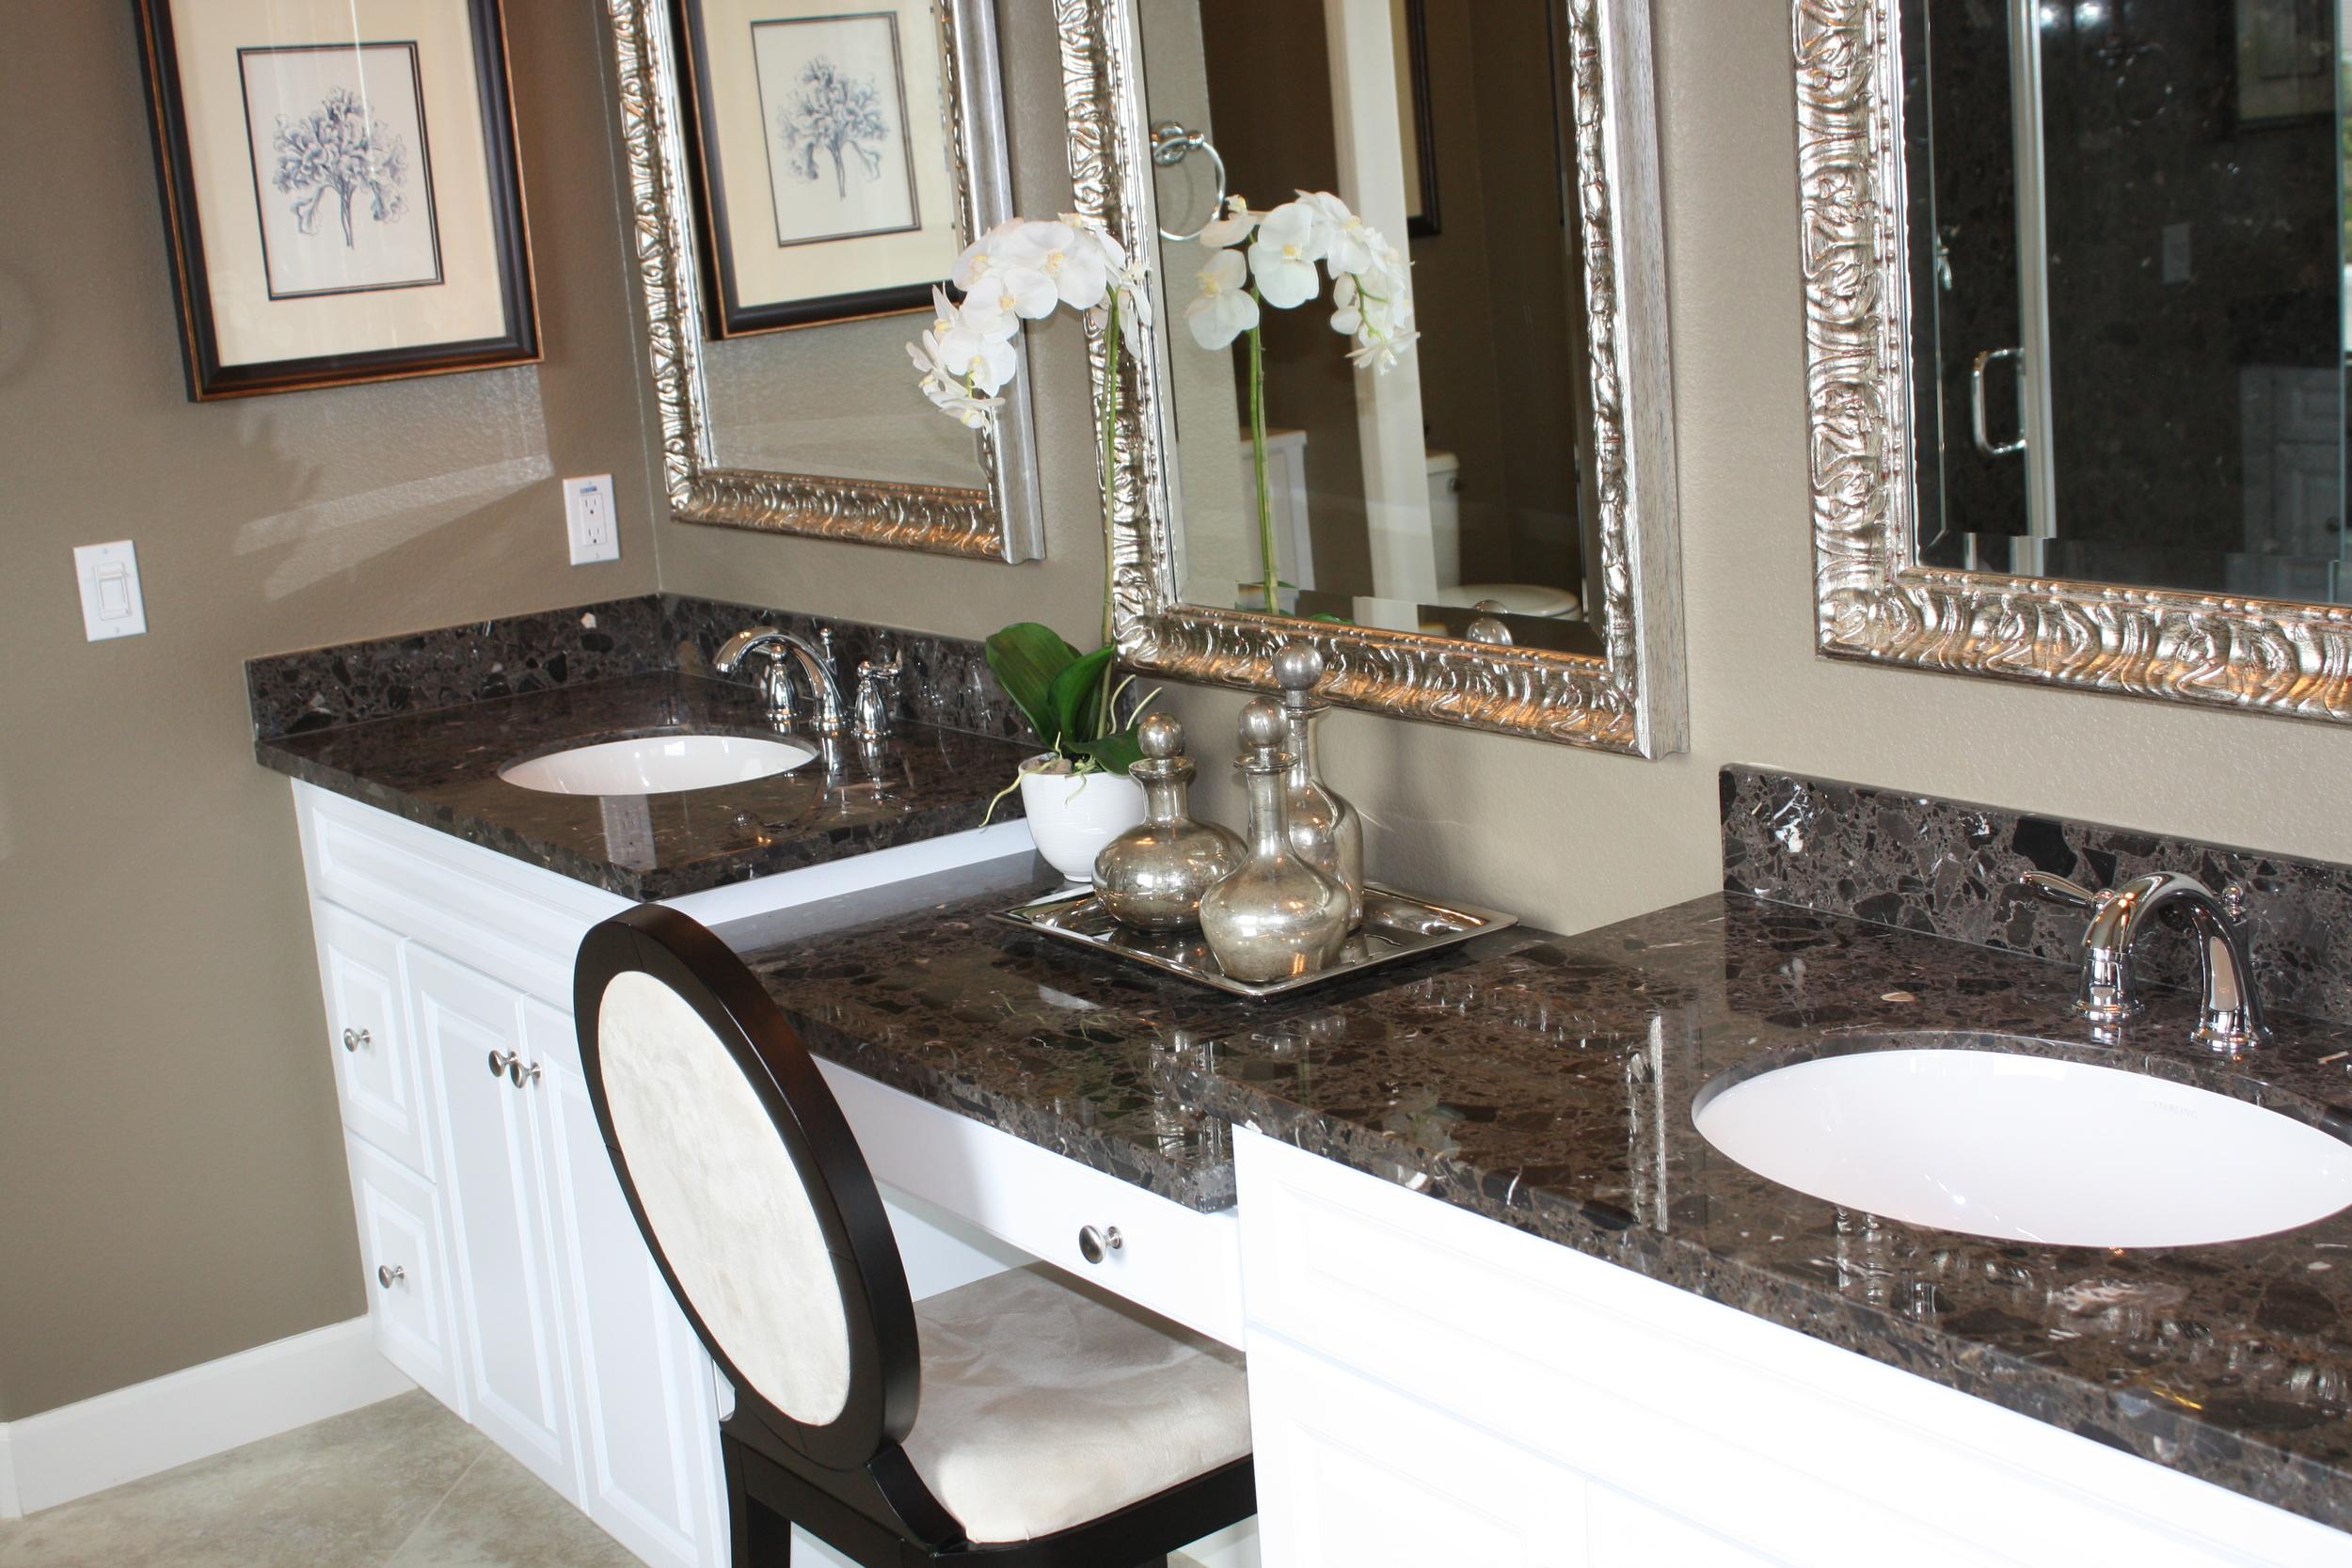 Roca Cafe Piadrafina Bathroom_Recycled Granite_Central Texas_Austin_Buda_Kyle_%22San Antonio%22_Granite Countertops.jpg